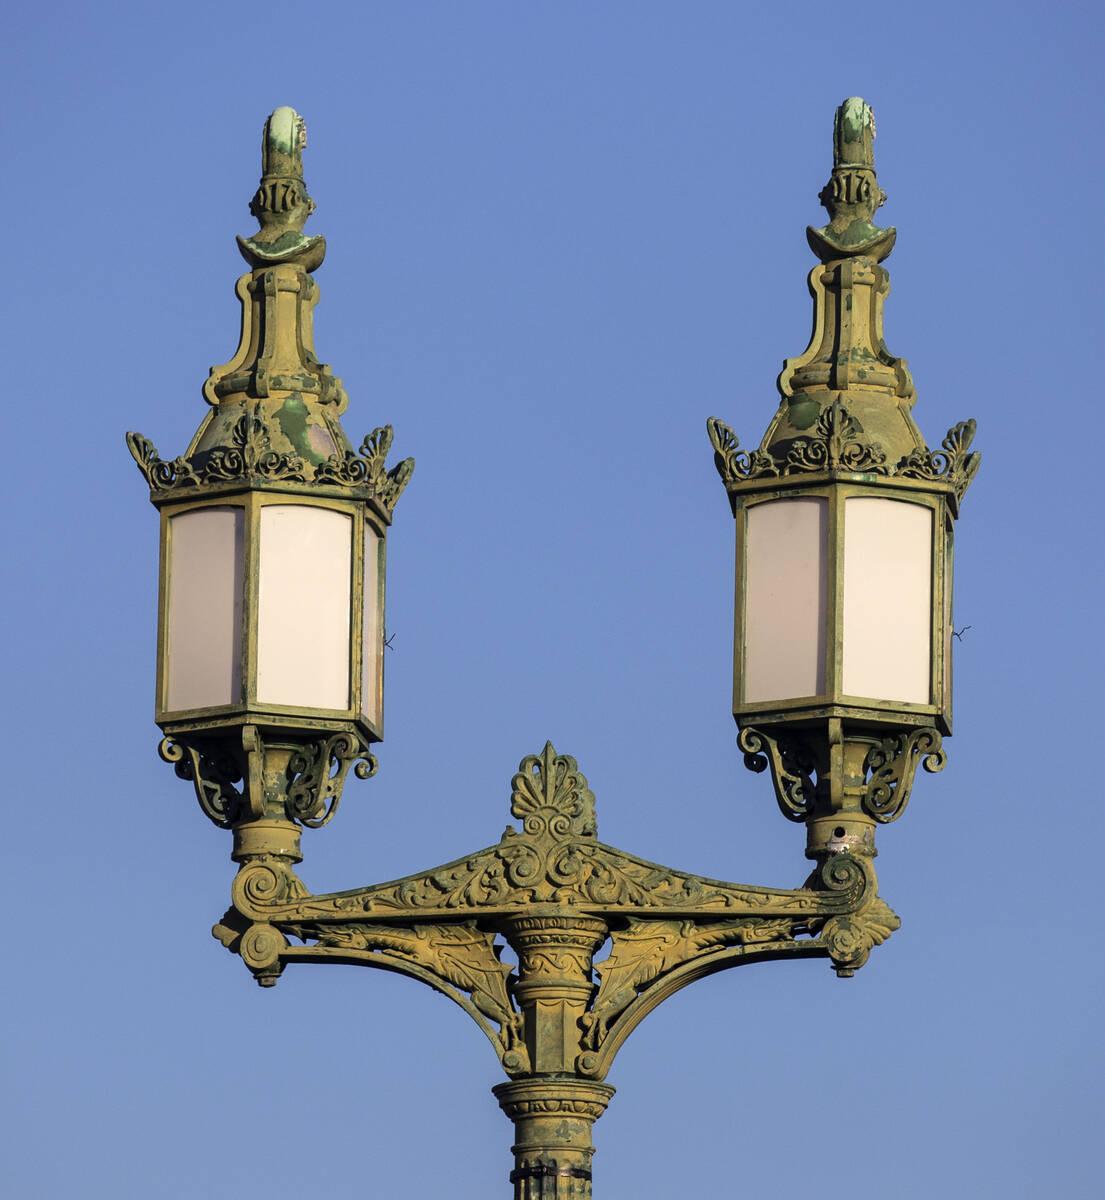 The historic street lamps atop London Bridge are shown on Sunday, Oct. 3, 2021, in Lake Havasu, ...